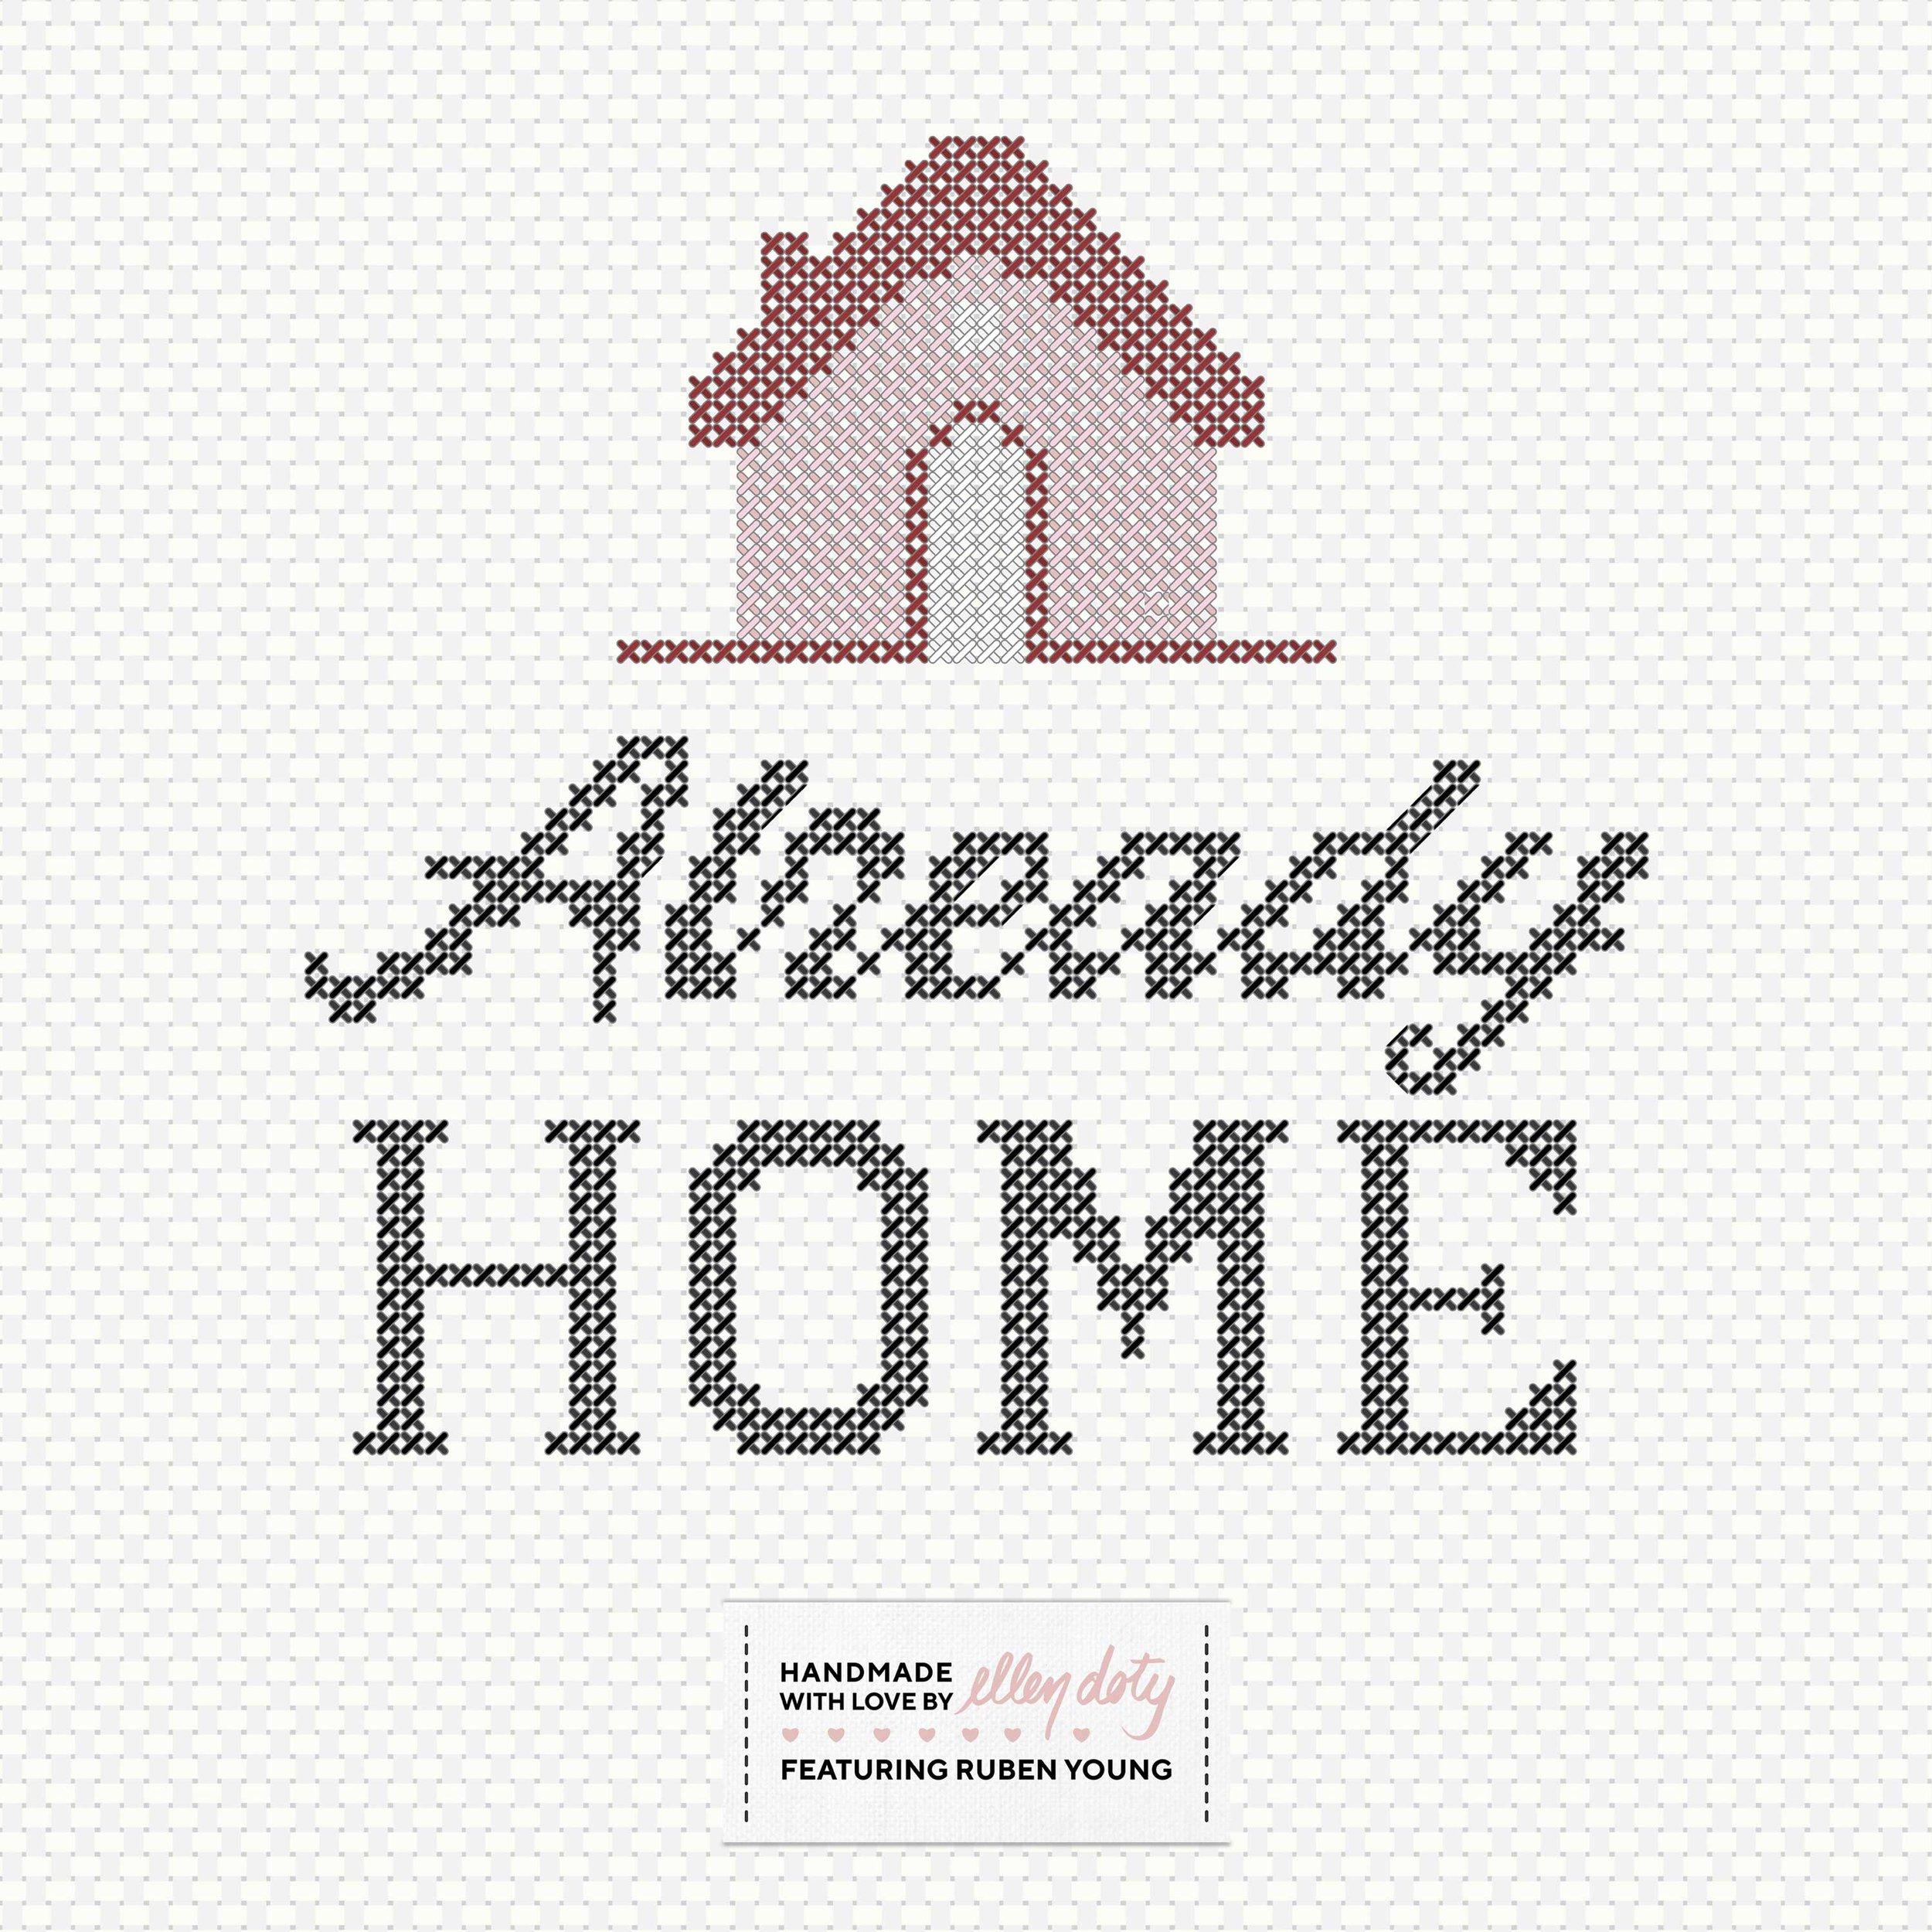 2018-145-Already-Home_FINAL-3000x3000.jpg